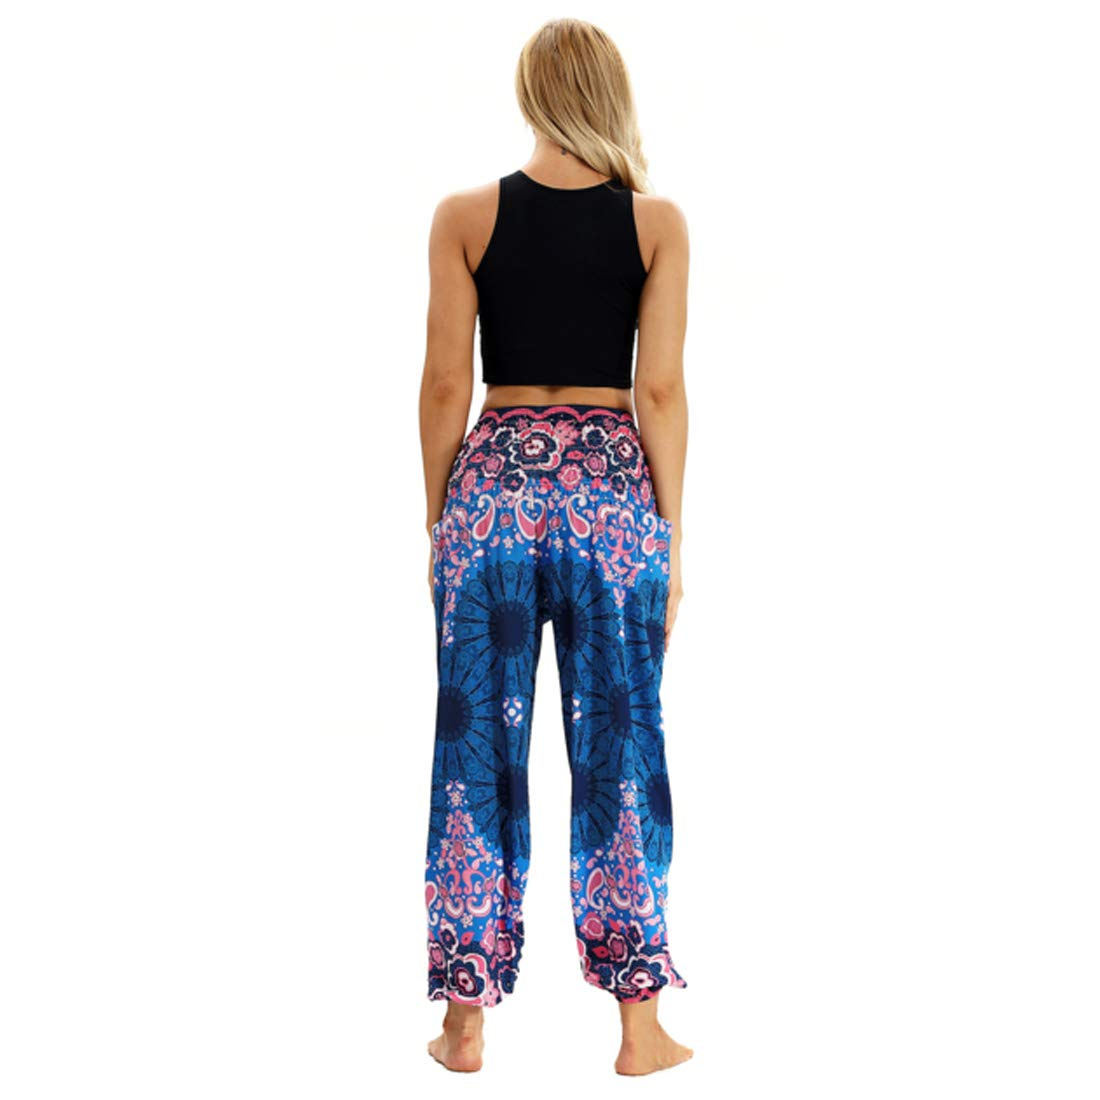 Aiweijia Pantalones de harén para Mujer Pantalones de Yoga ...